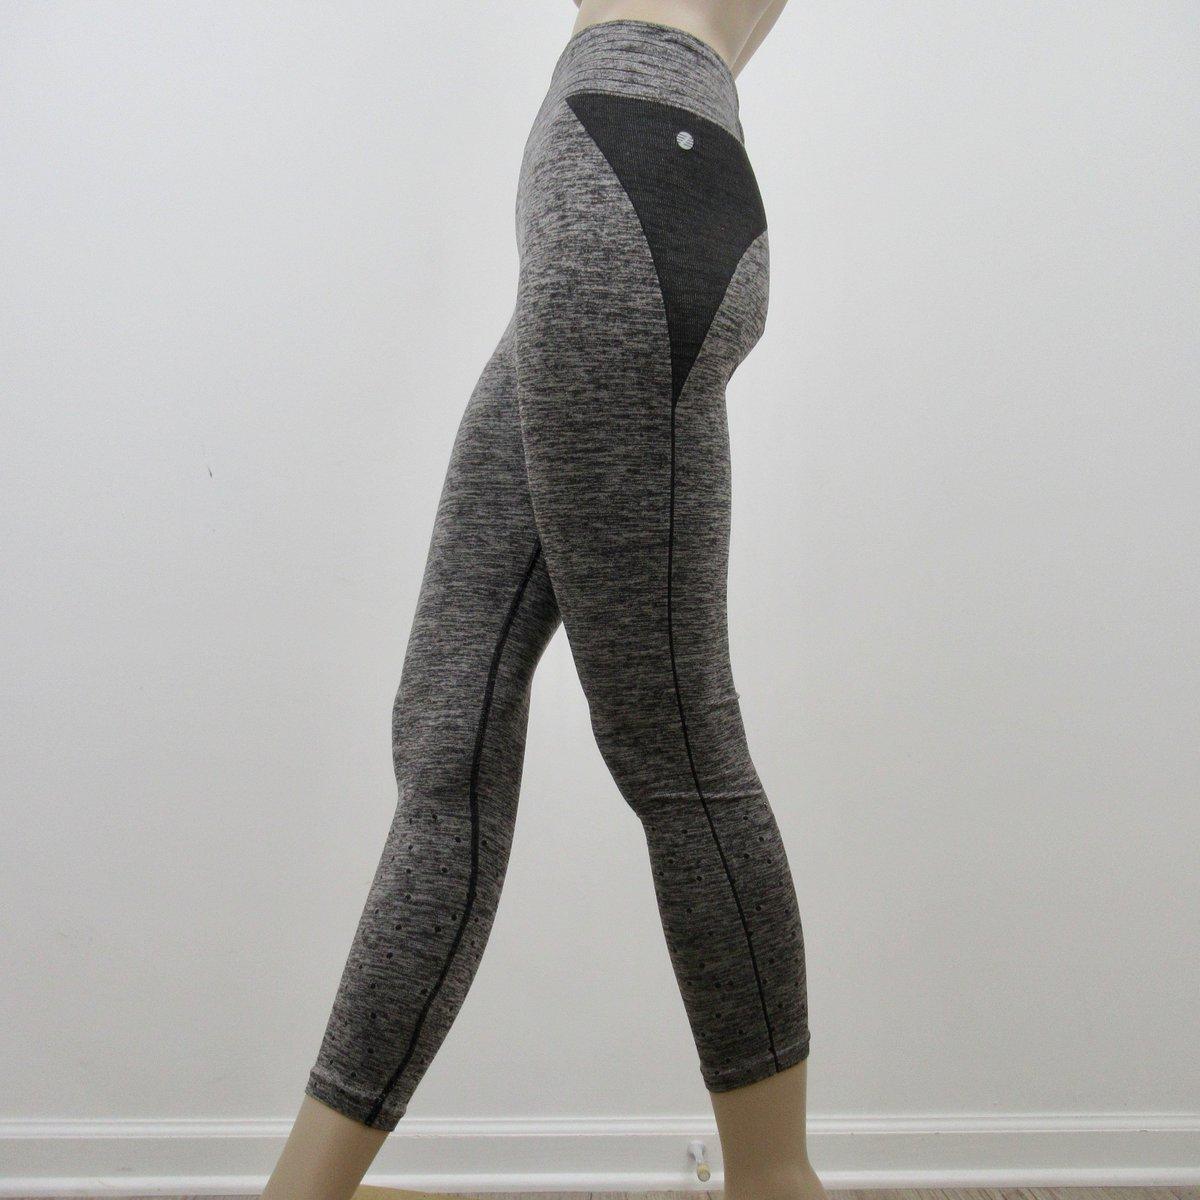 4268c208bab JUST IN  20  Zella  Yoga  Pilates  Leggings  runners  running  activewear   pilates  soulcycle  louloulemon  shopnow  shopsmall  shopmycloset   instashop ...